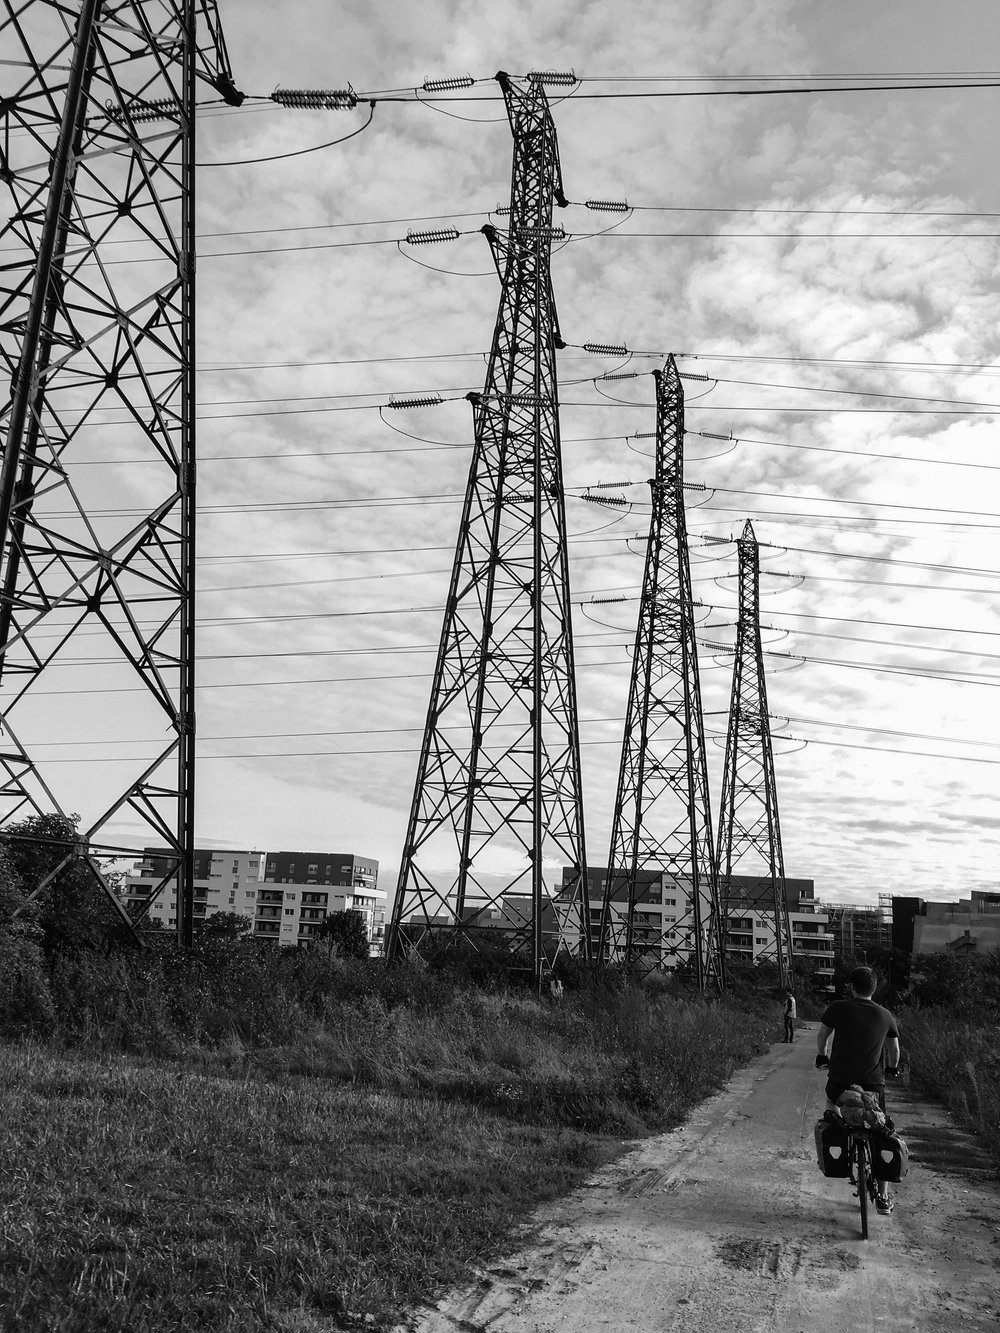 Tom_Oliver_Payne_London_to_Paris_Cycle-19.jpg